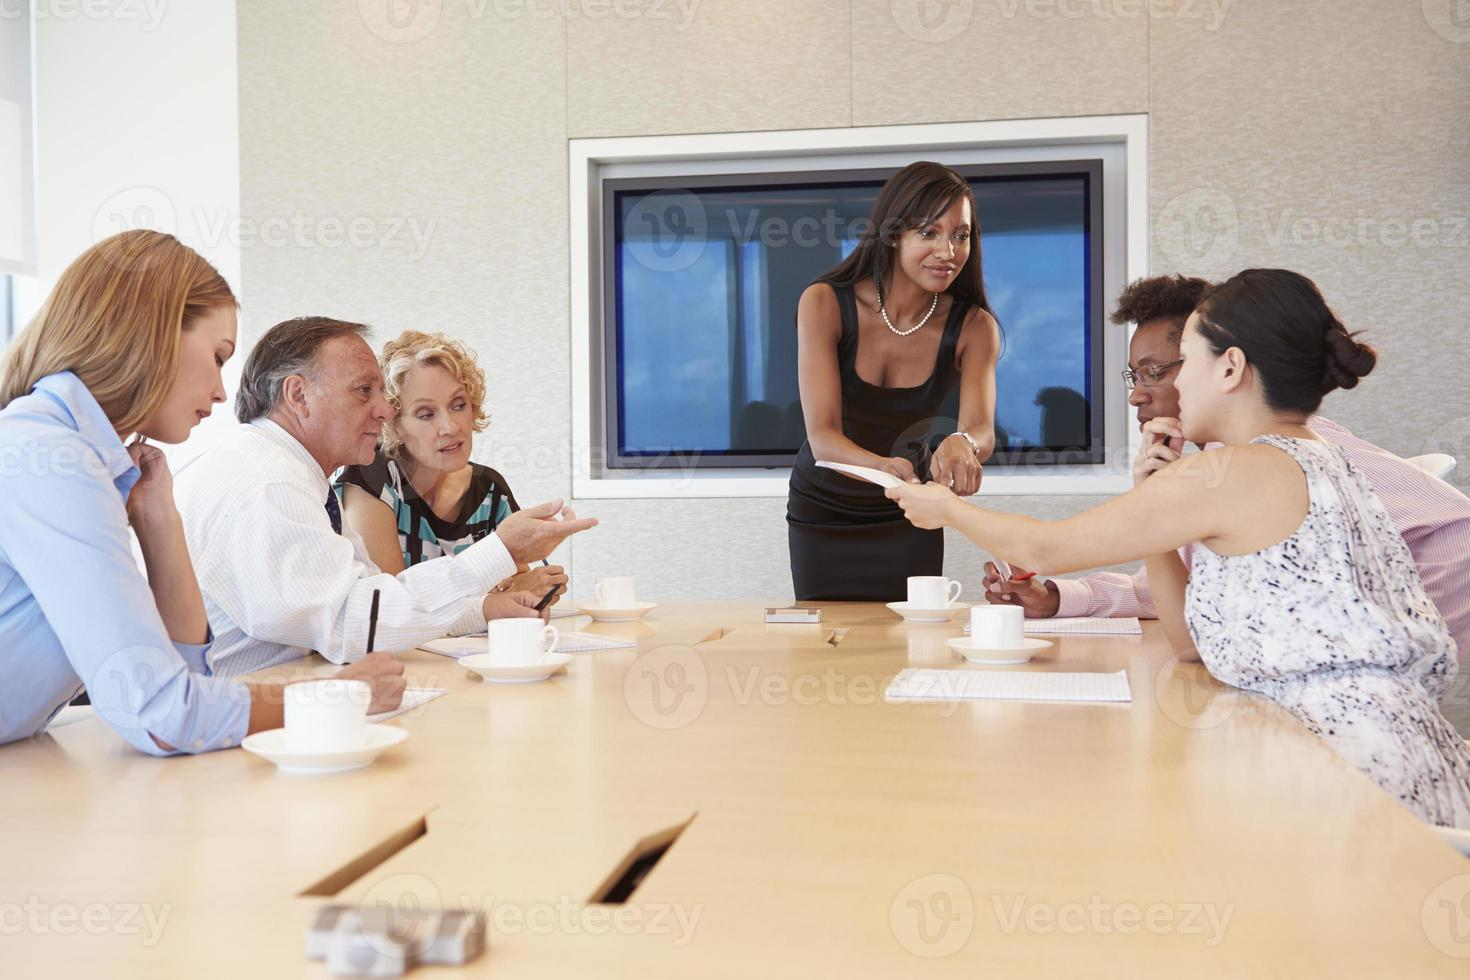 affärskvinna vid skärm adressera styrelsens möte foto